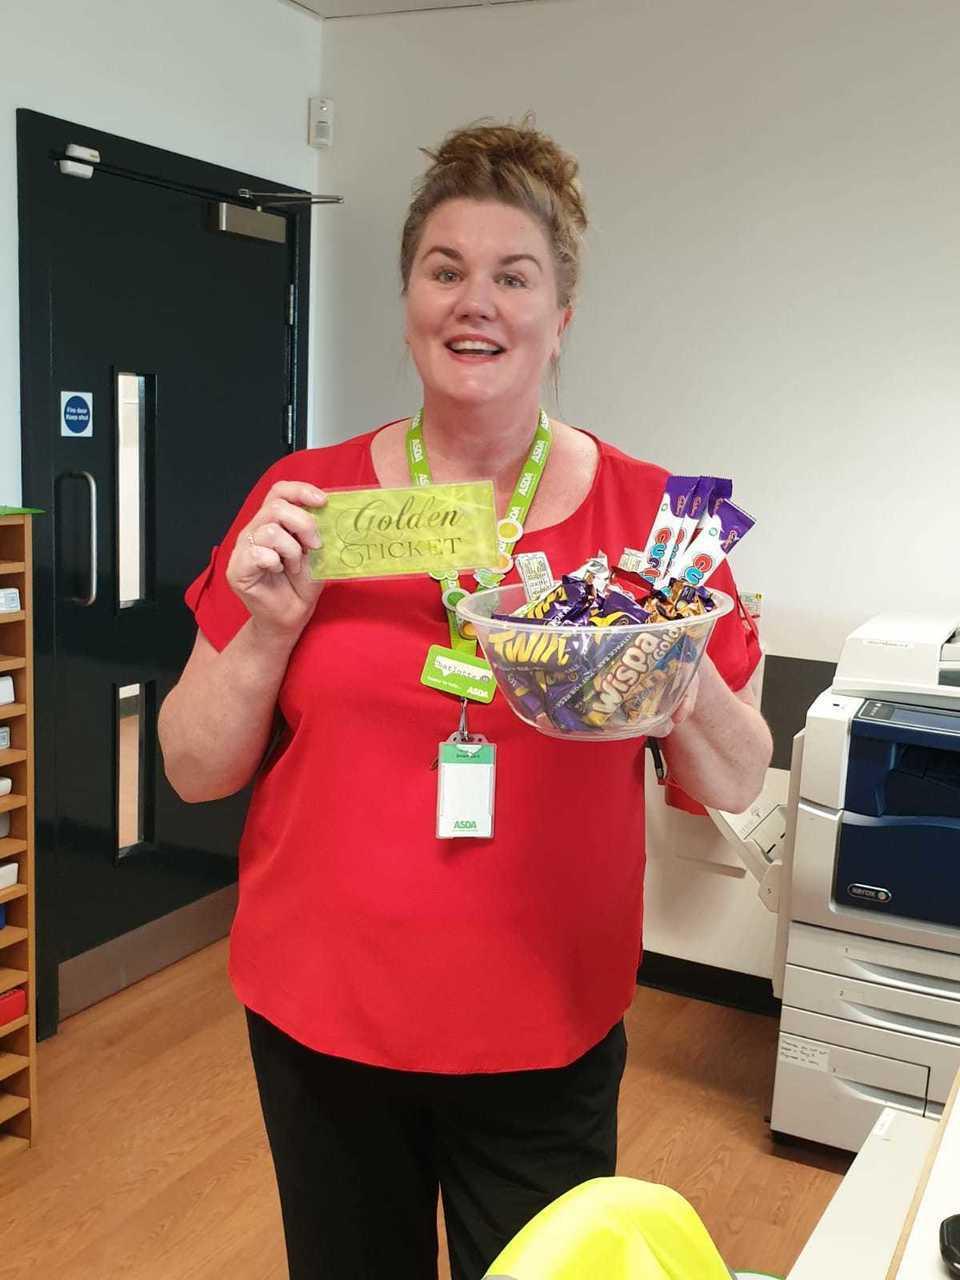 Celebrating our colleagues | Asda Clacton-on-Sea